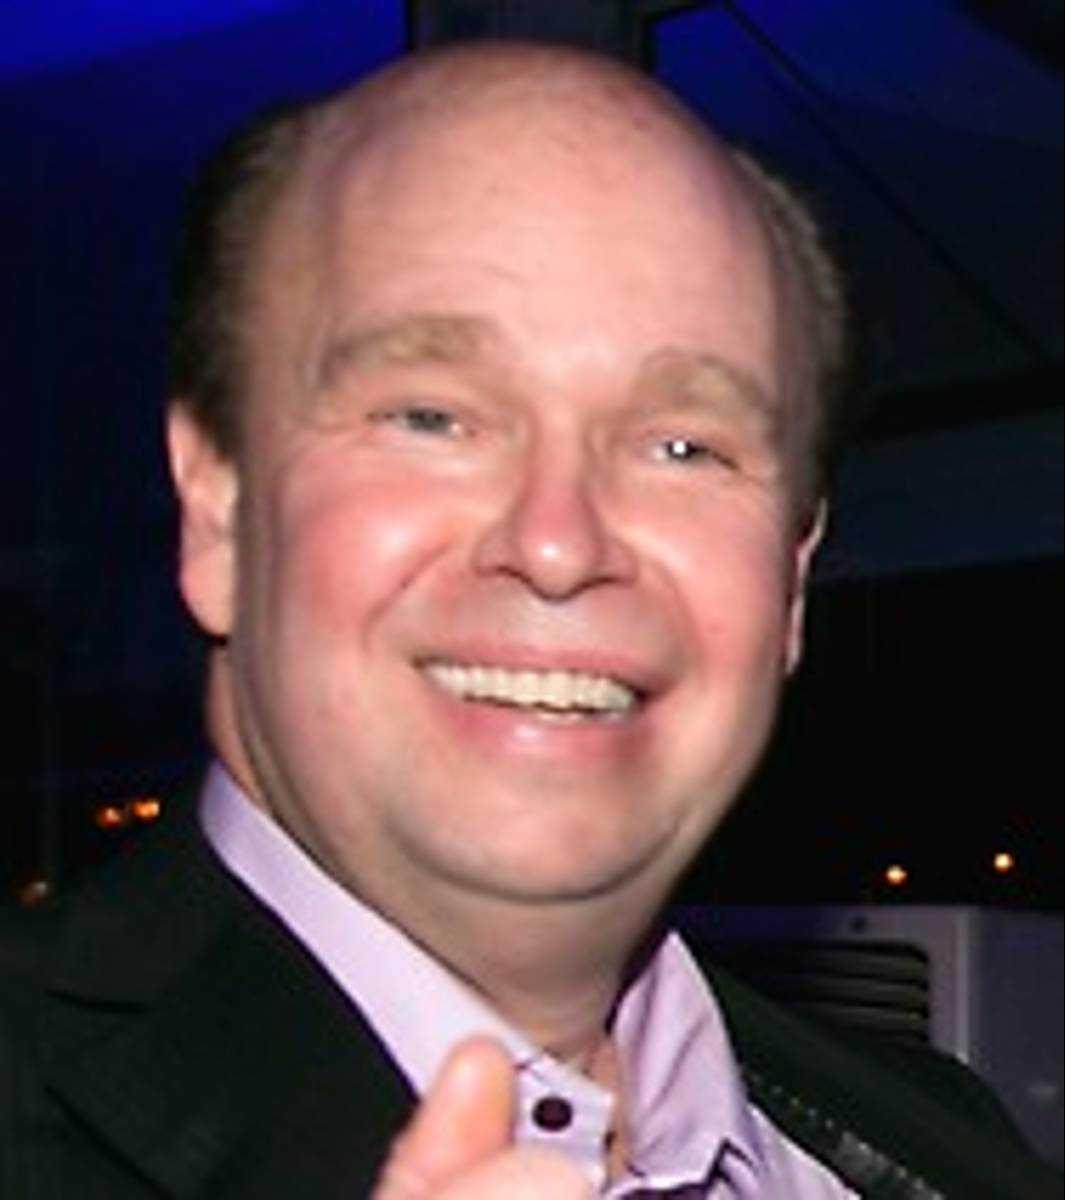 Lasse Kronér gillar valet av Marie Serneholt.